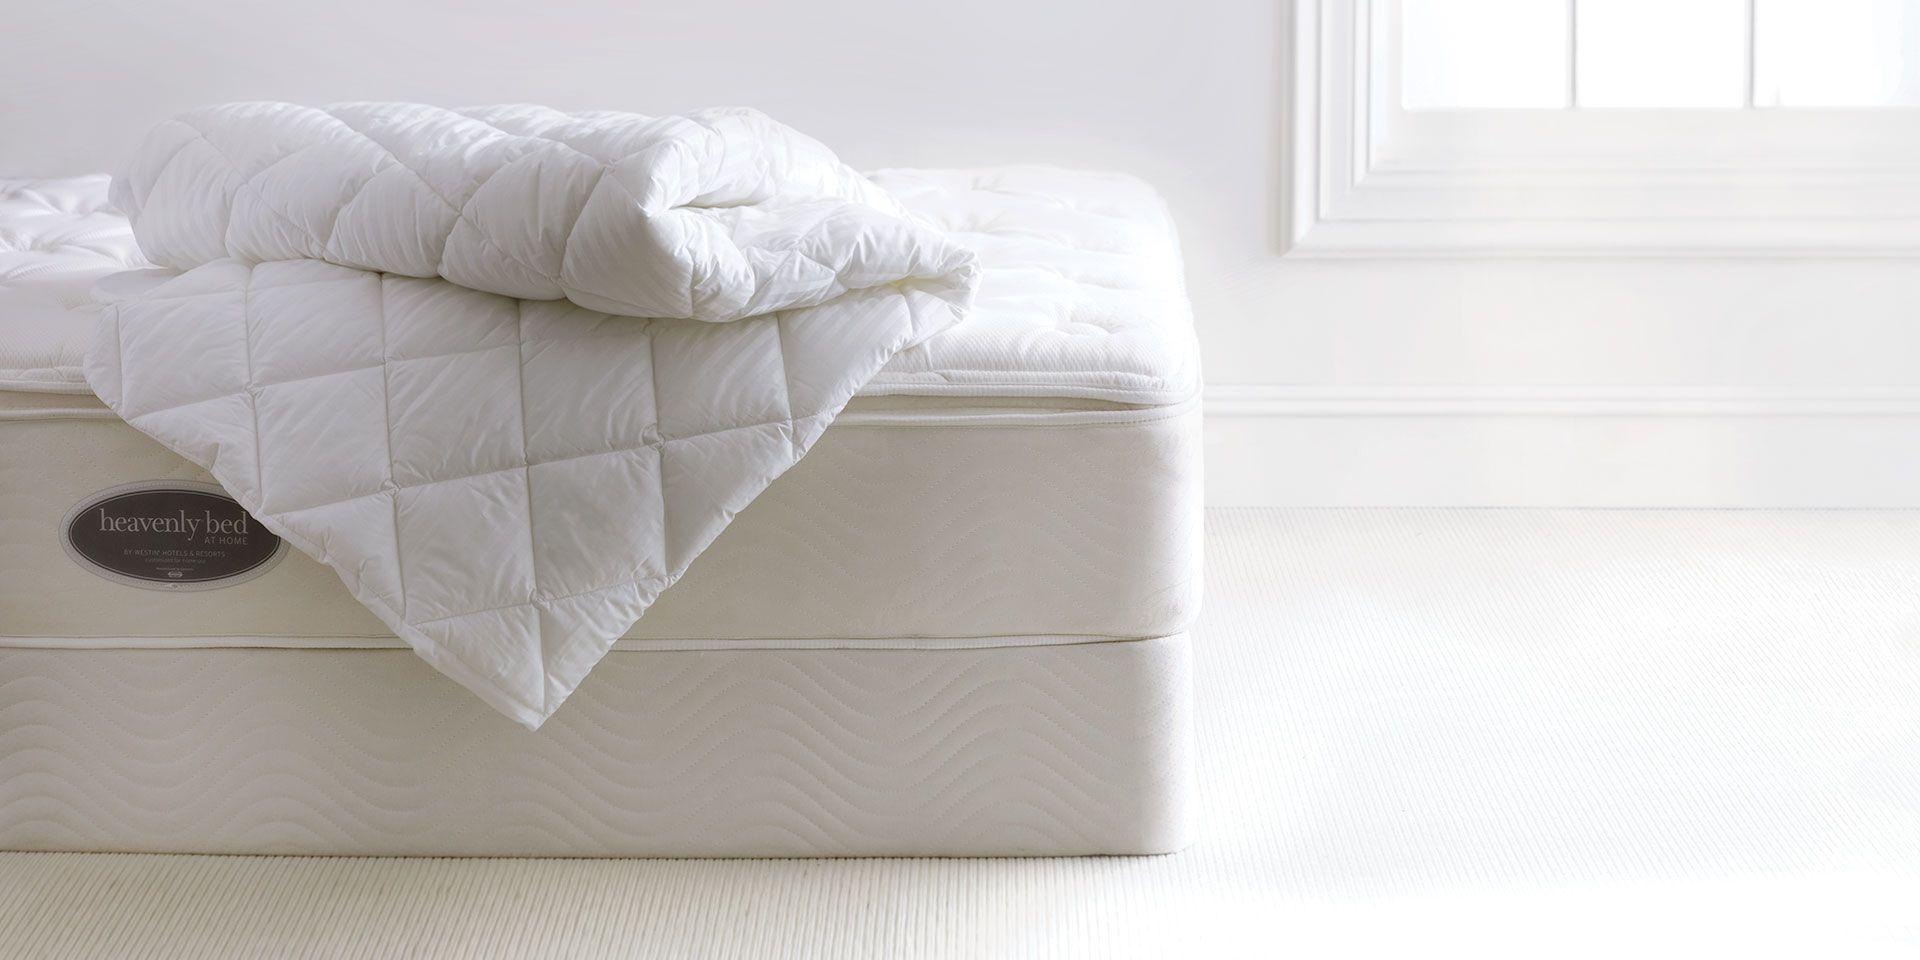 Customized Logo Hotel Linen 4pcs Cotton Jacquard Bed Sheet